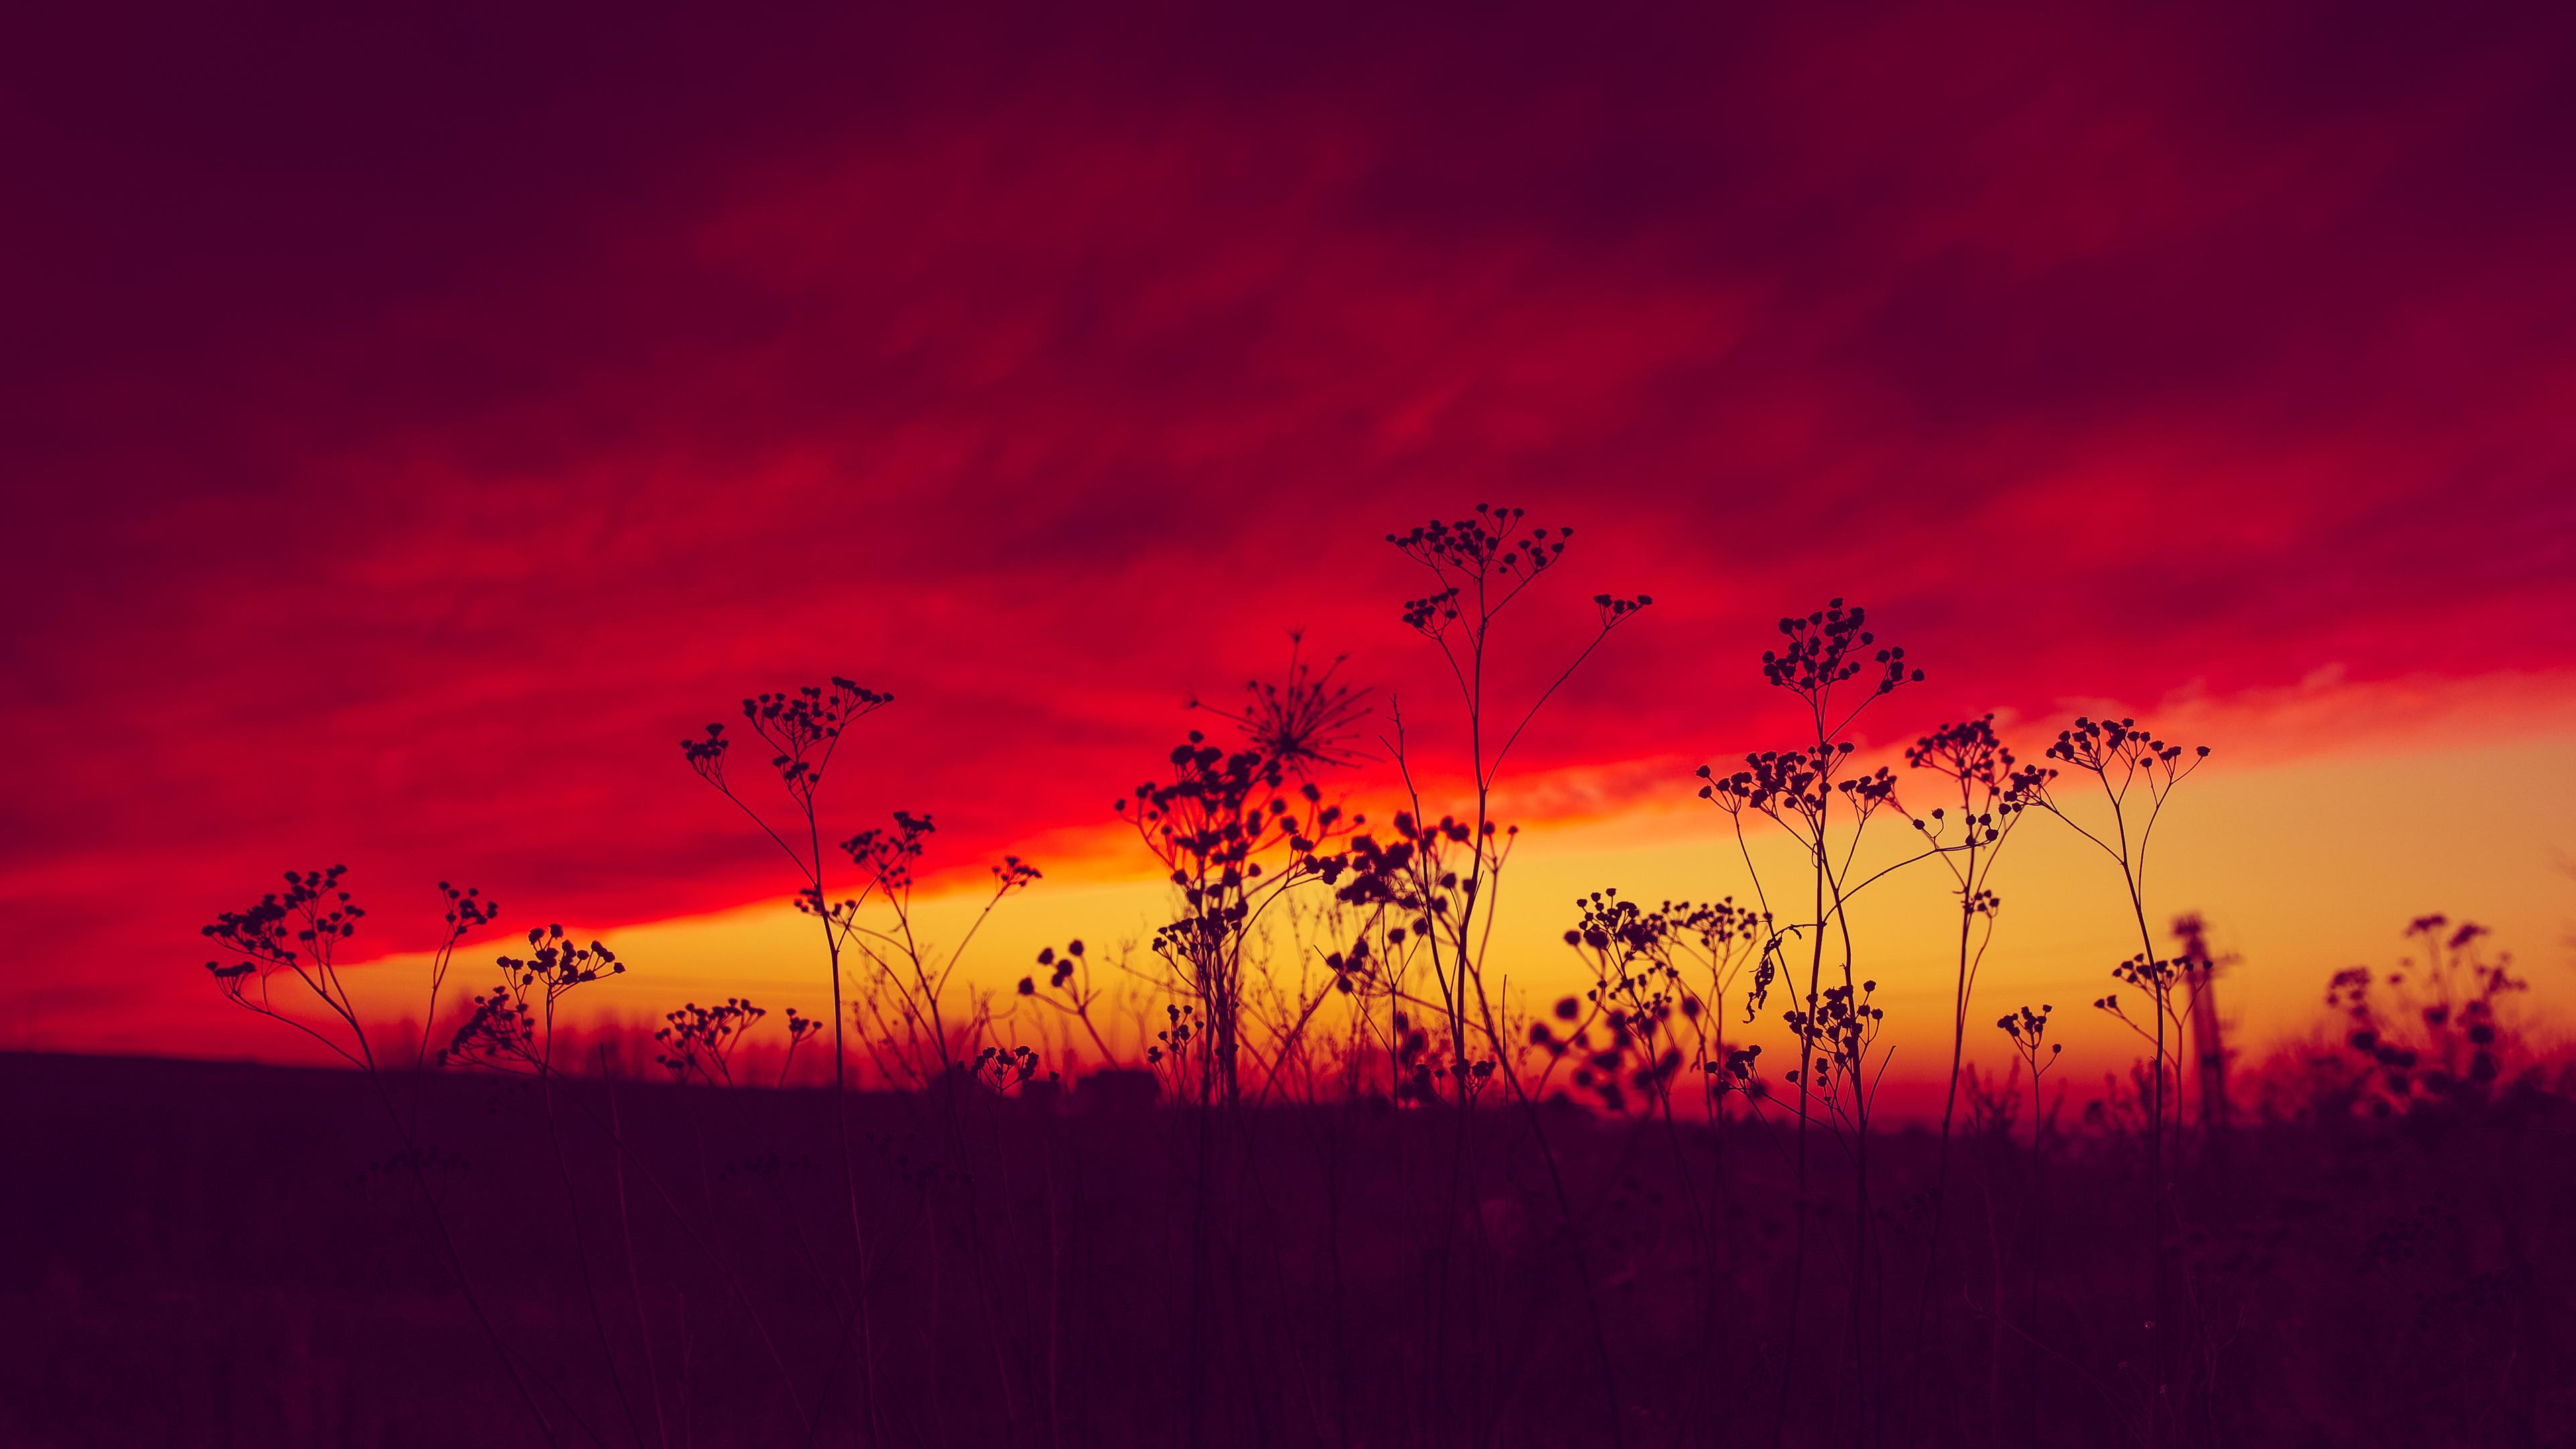 poland sunset 4k 1551644222 - Poland Sunset 4k - sunset wallpapers, poland wallpapers, nature wallpapers, hd-wallpapers, evening wallpapers, 4k-wallpapers